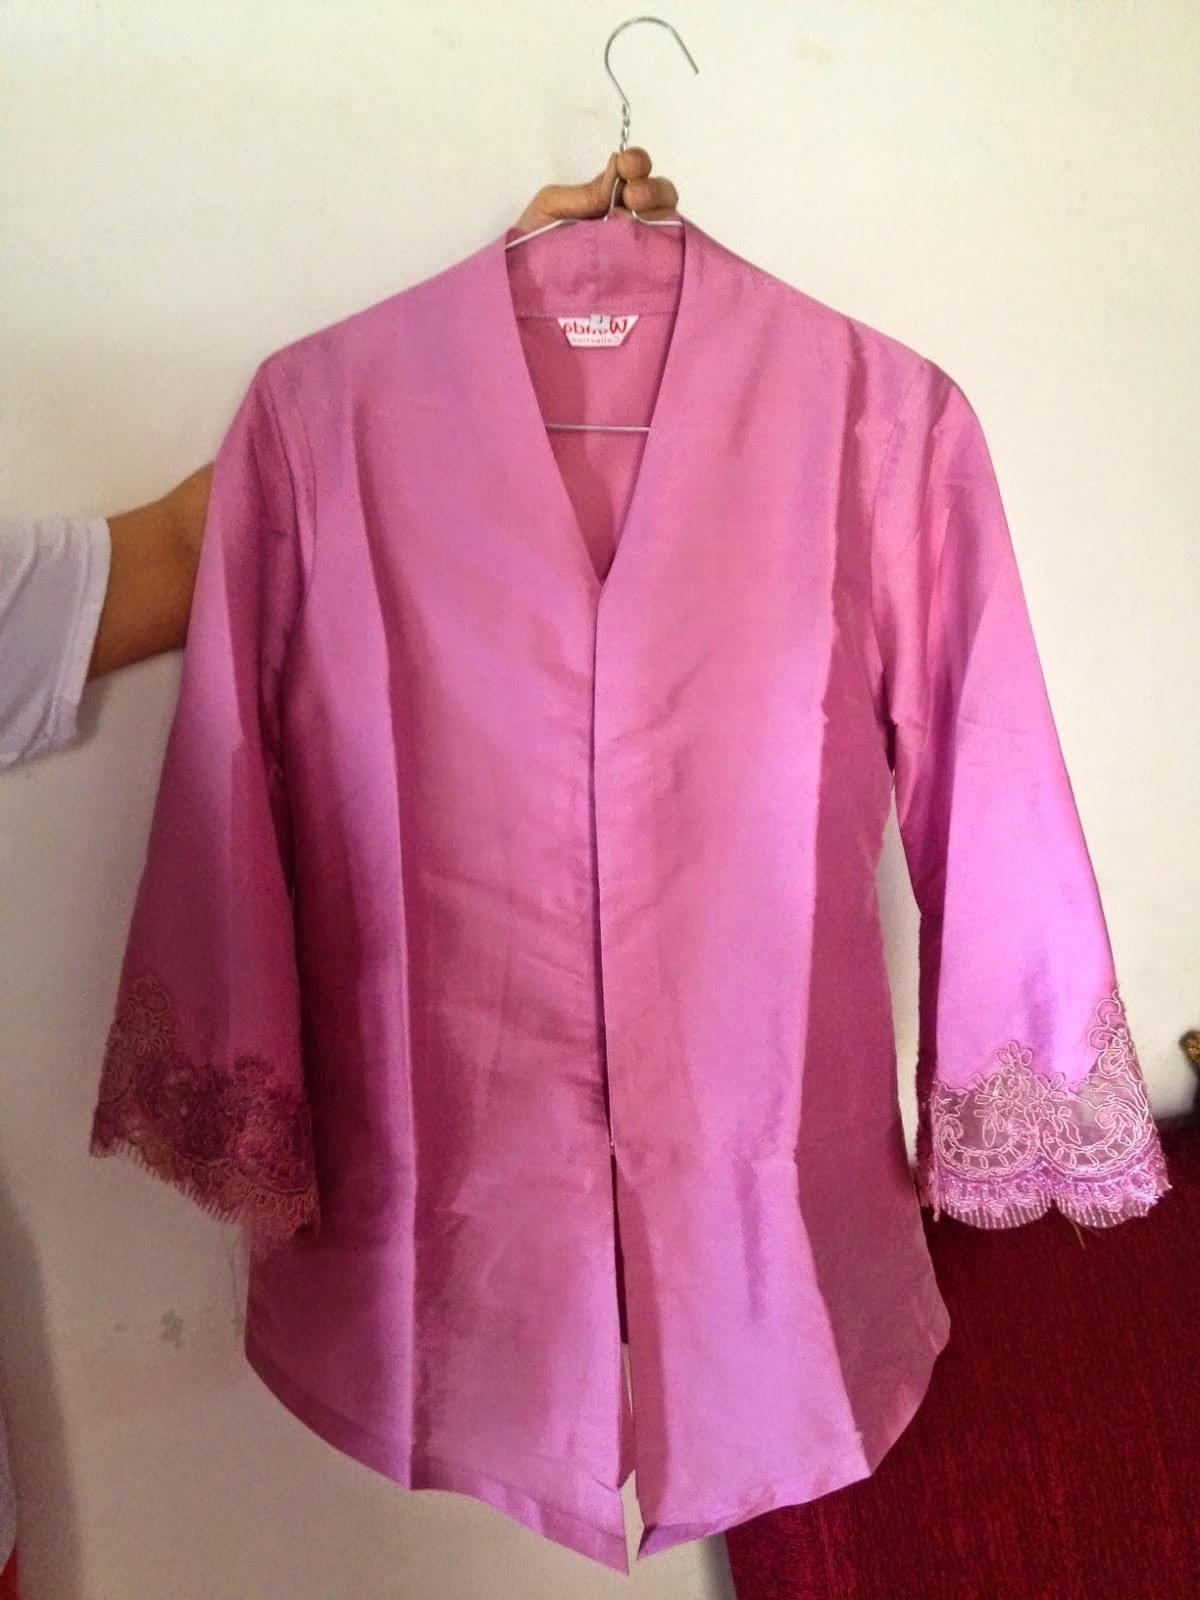 Inspirasi Model Baju Lebaran Di Thamrin City Mndw Kumpulan Foto Model Baju Kebaya Di Thamrin City Trend